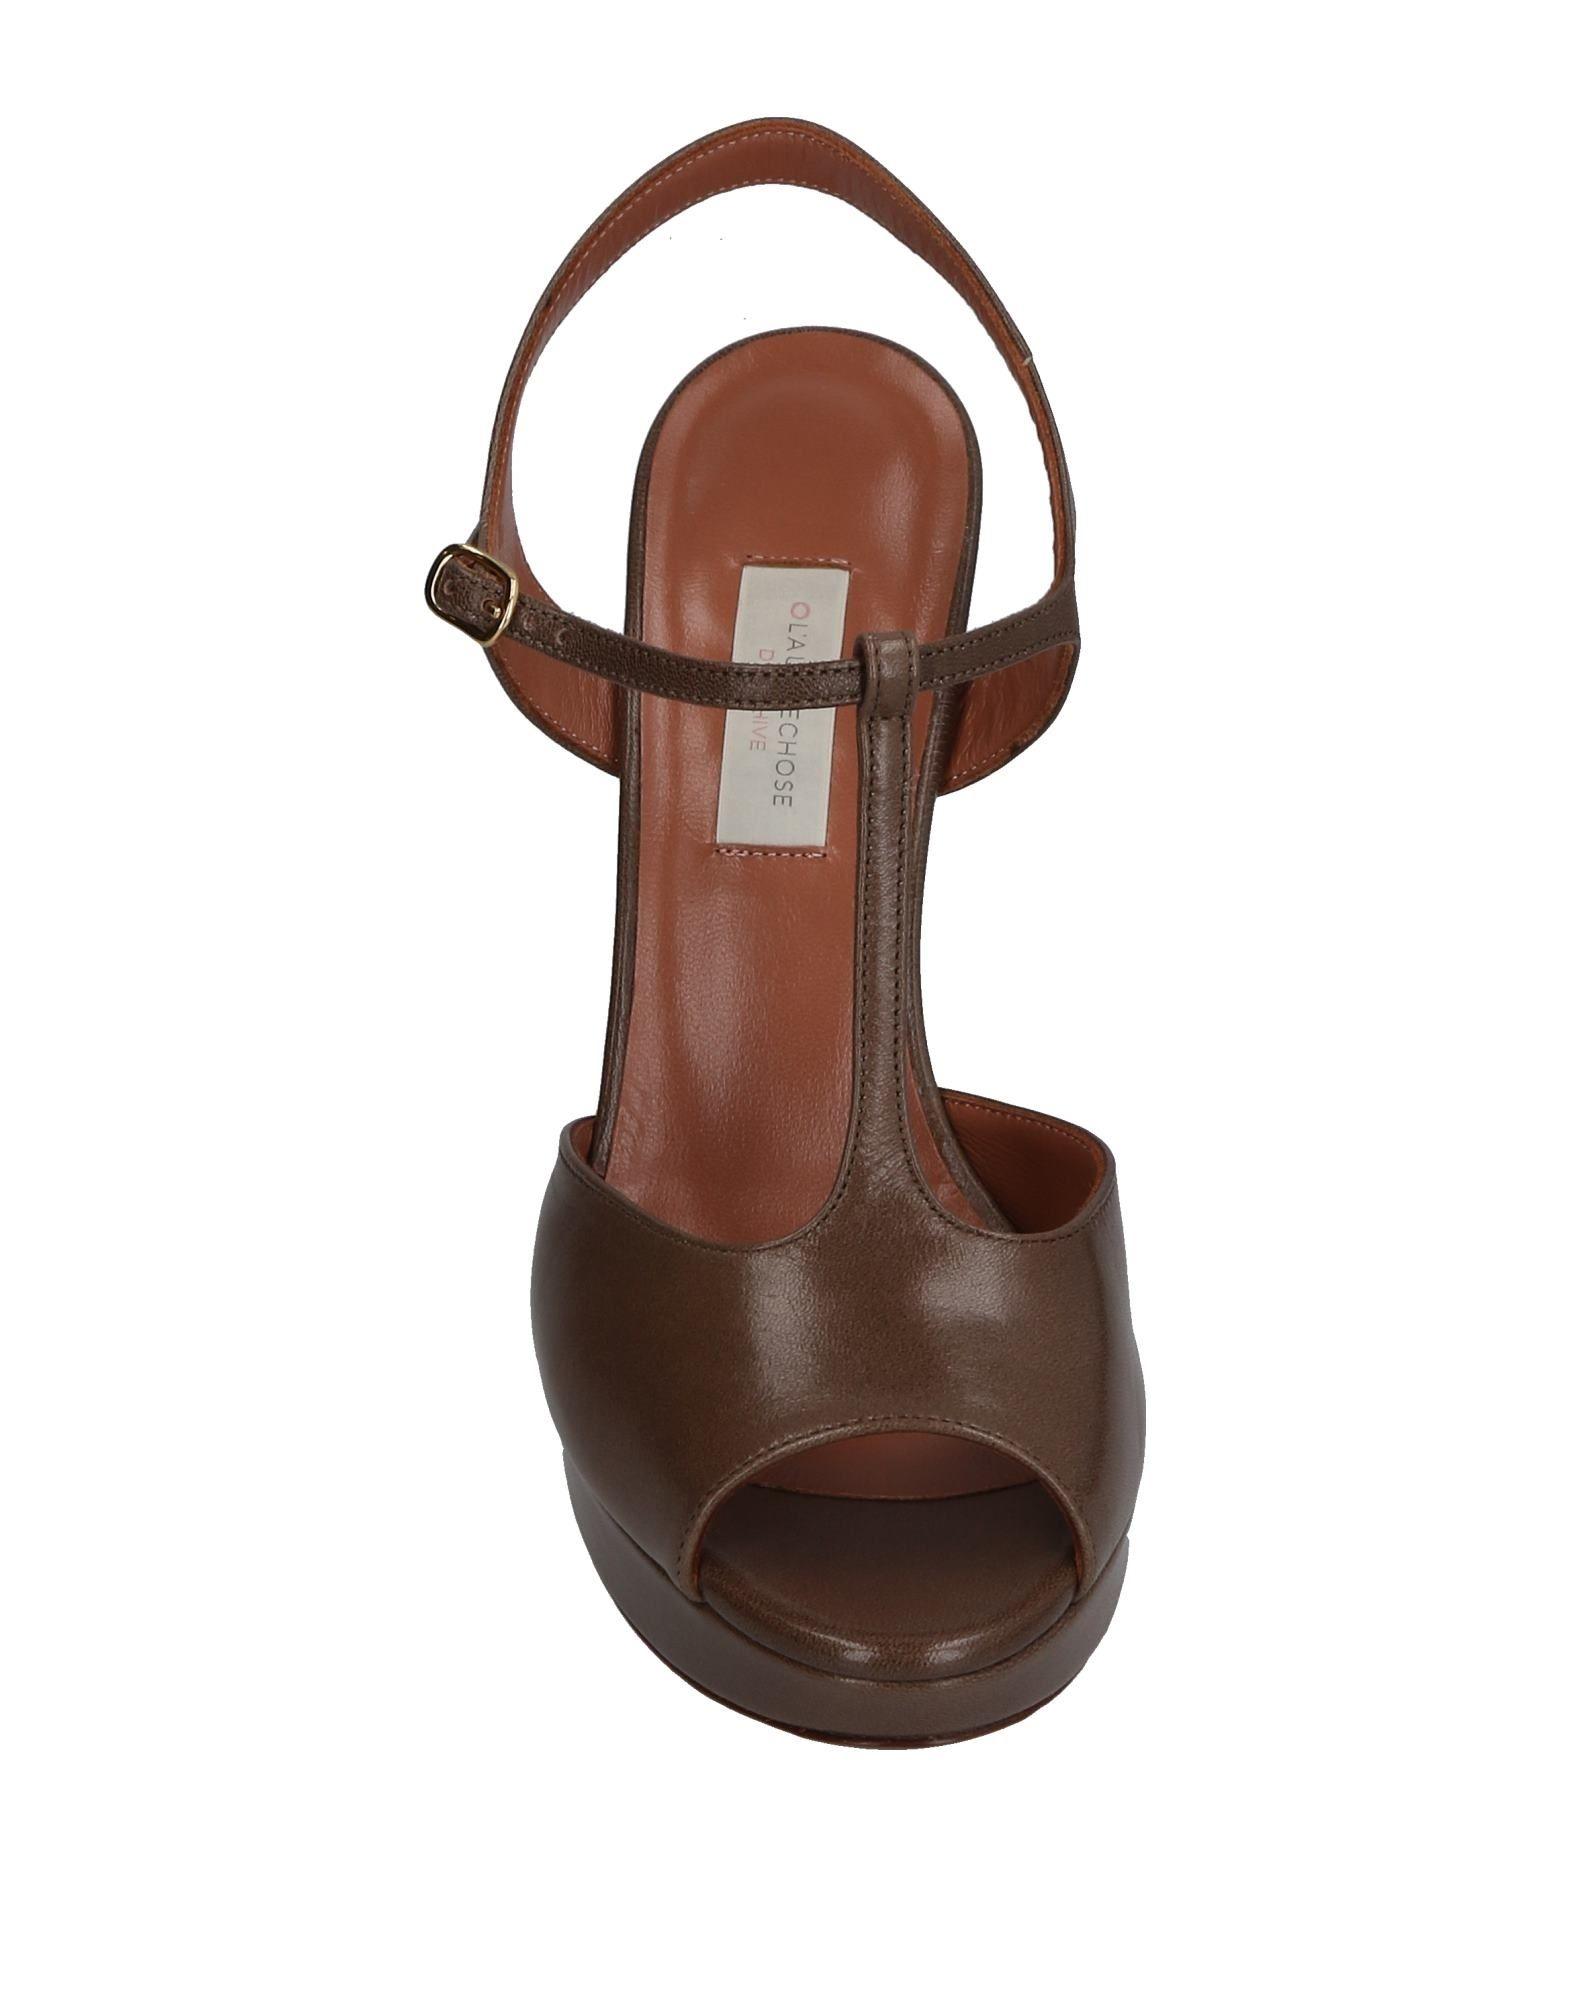 Stilvolle billige Schuhe L' Autre Chose Sandalen Damen Damen Damen  11303127UO 563069